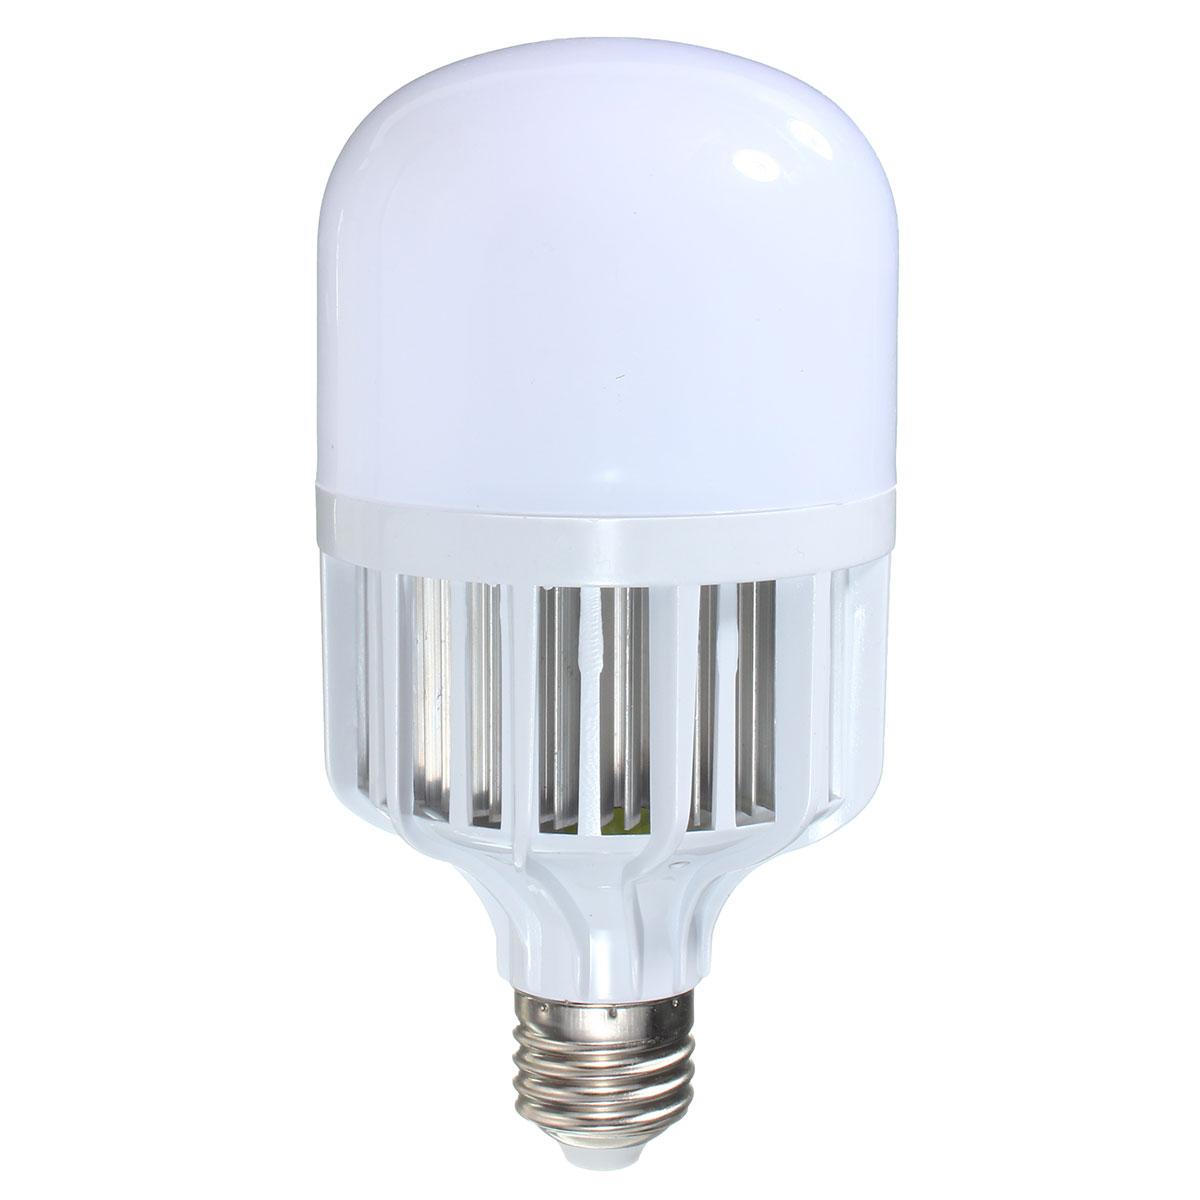 e27 b22 14w 5730 smd led blub light 550lumens white bright for home bedroom ac220v. Black Bedroom Furniture Sets. Home Design Ideas